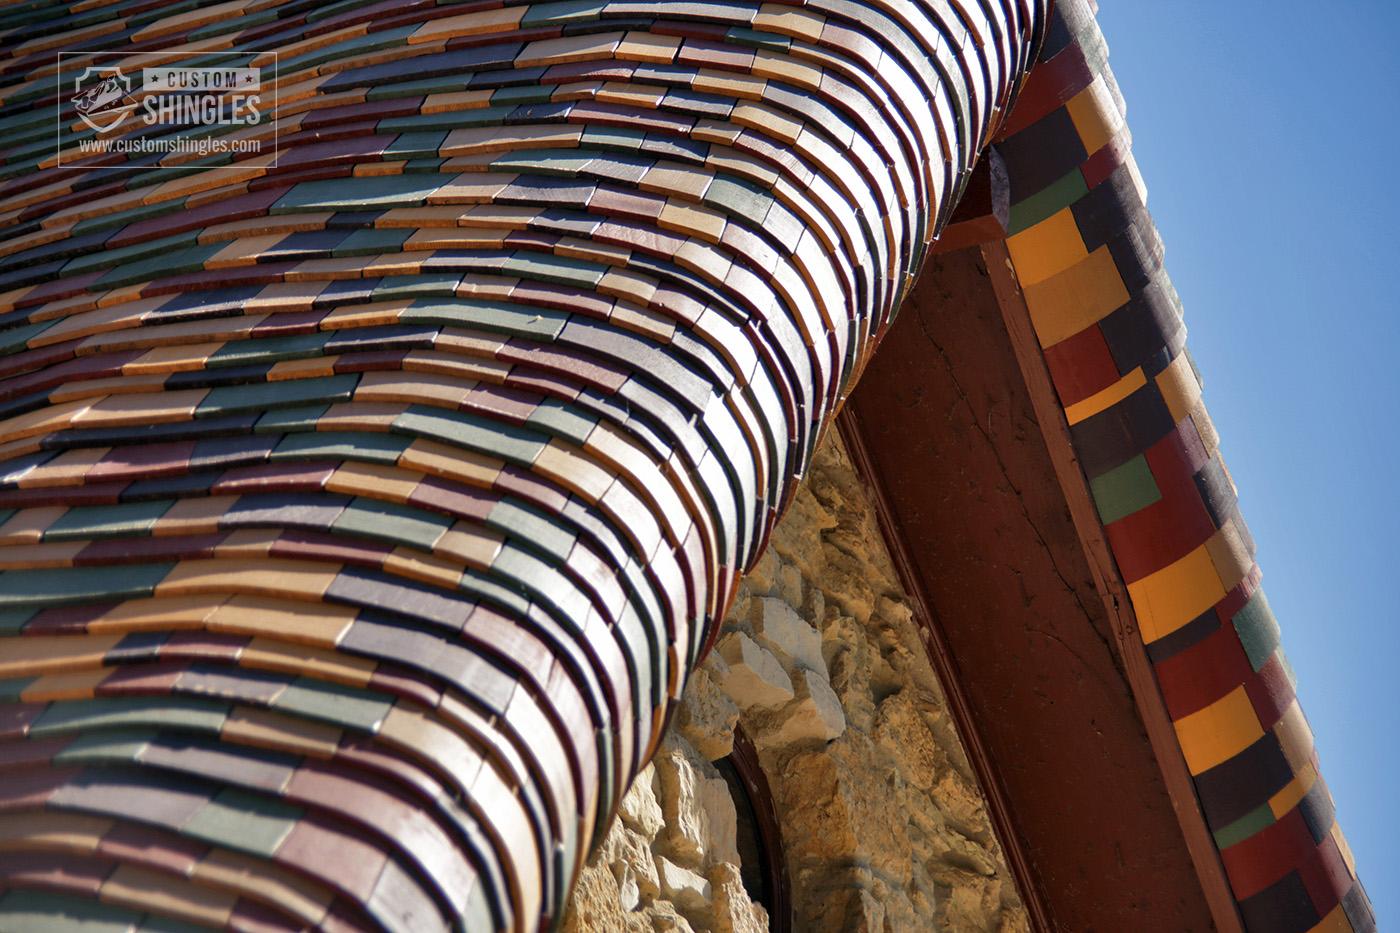 charleston sc bent shingles on a church